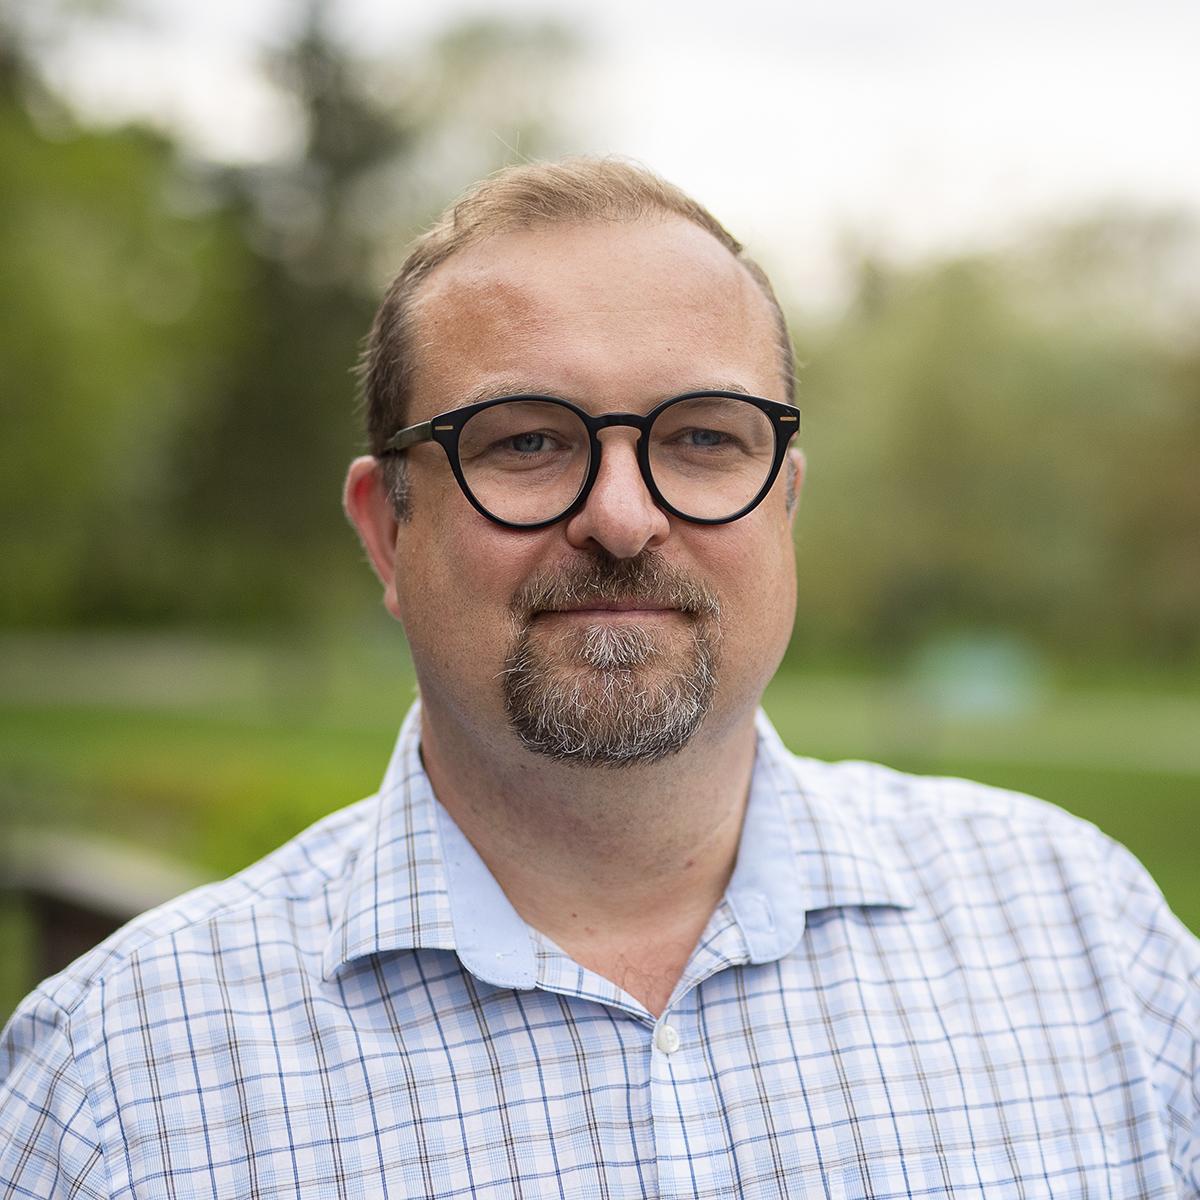 Jarno Erkamaa tehtanjohtaja